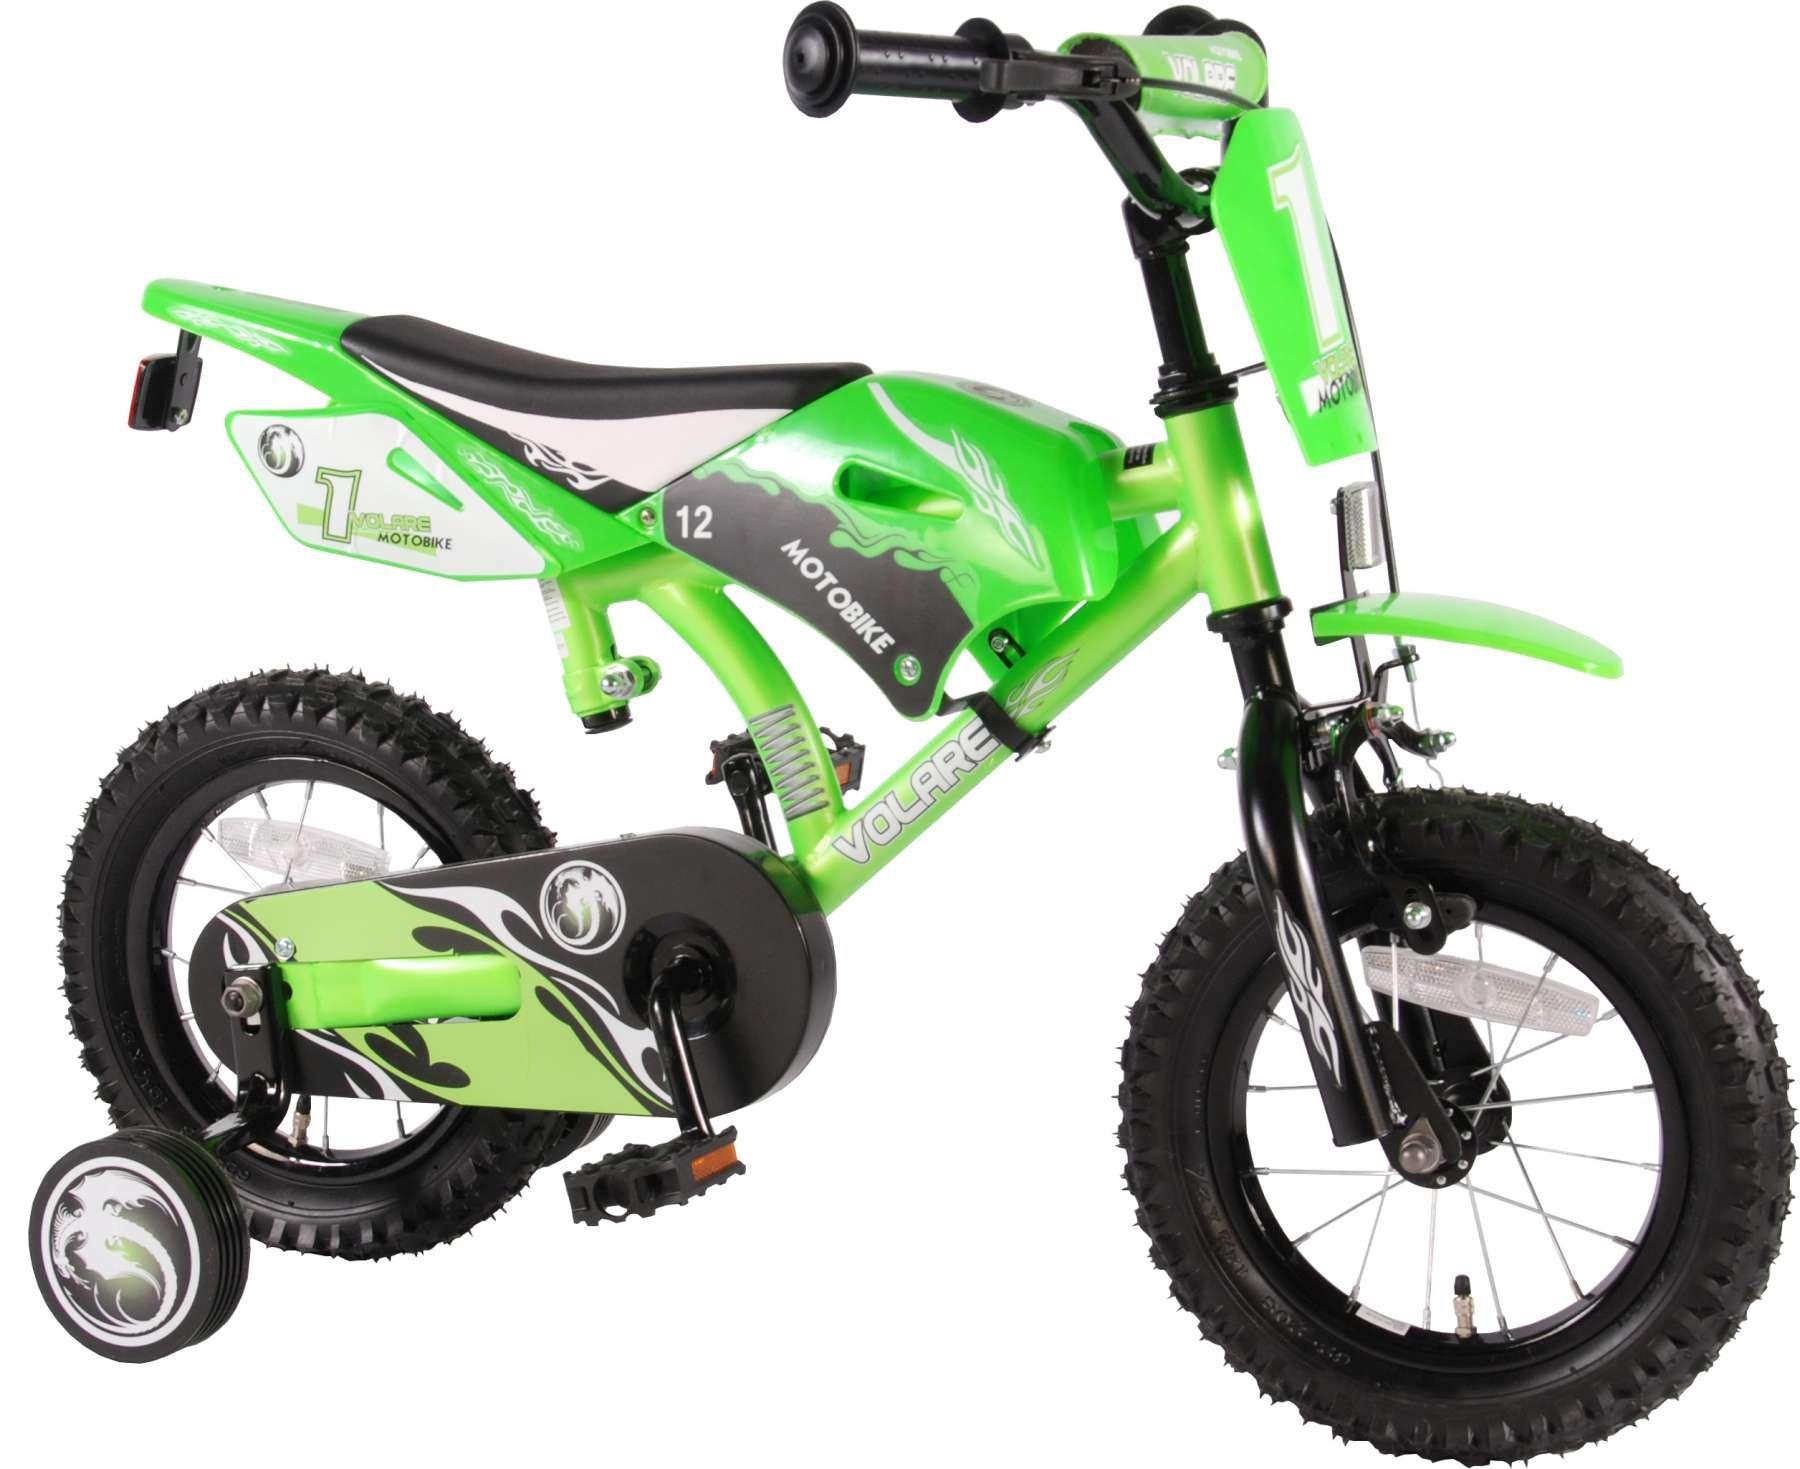 Volare Moto Bike 12 pulgadas verde – Bicicleta infantil con freno ...